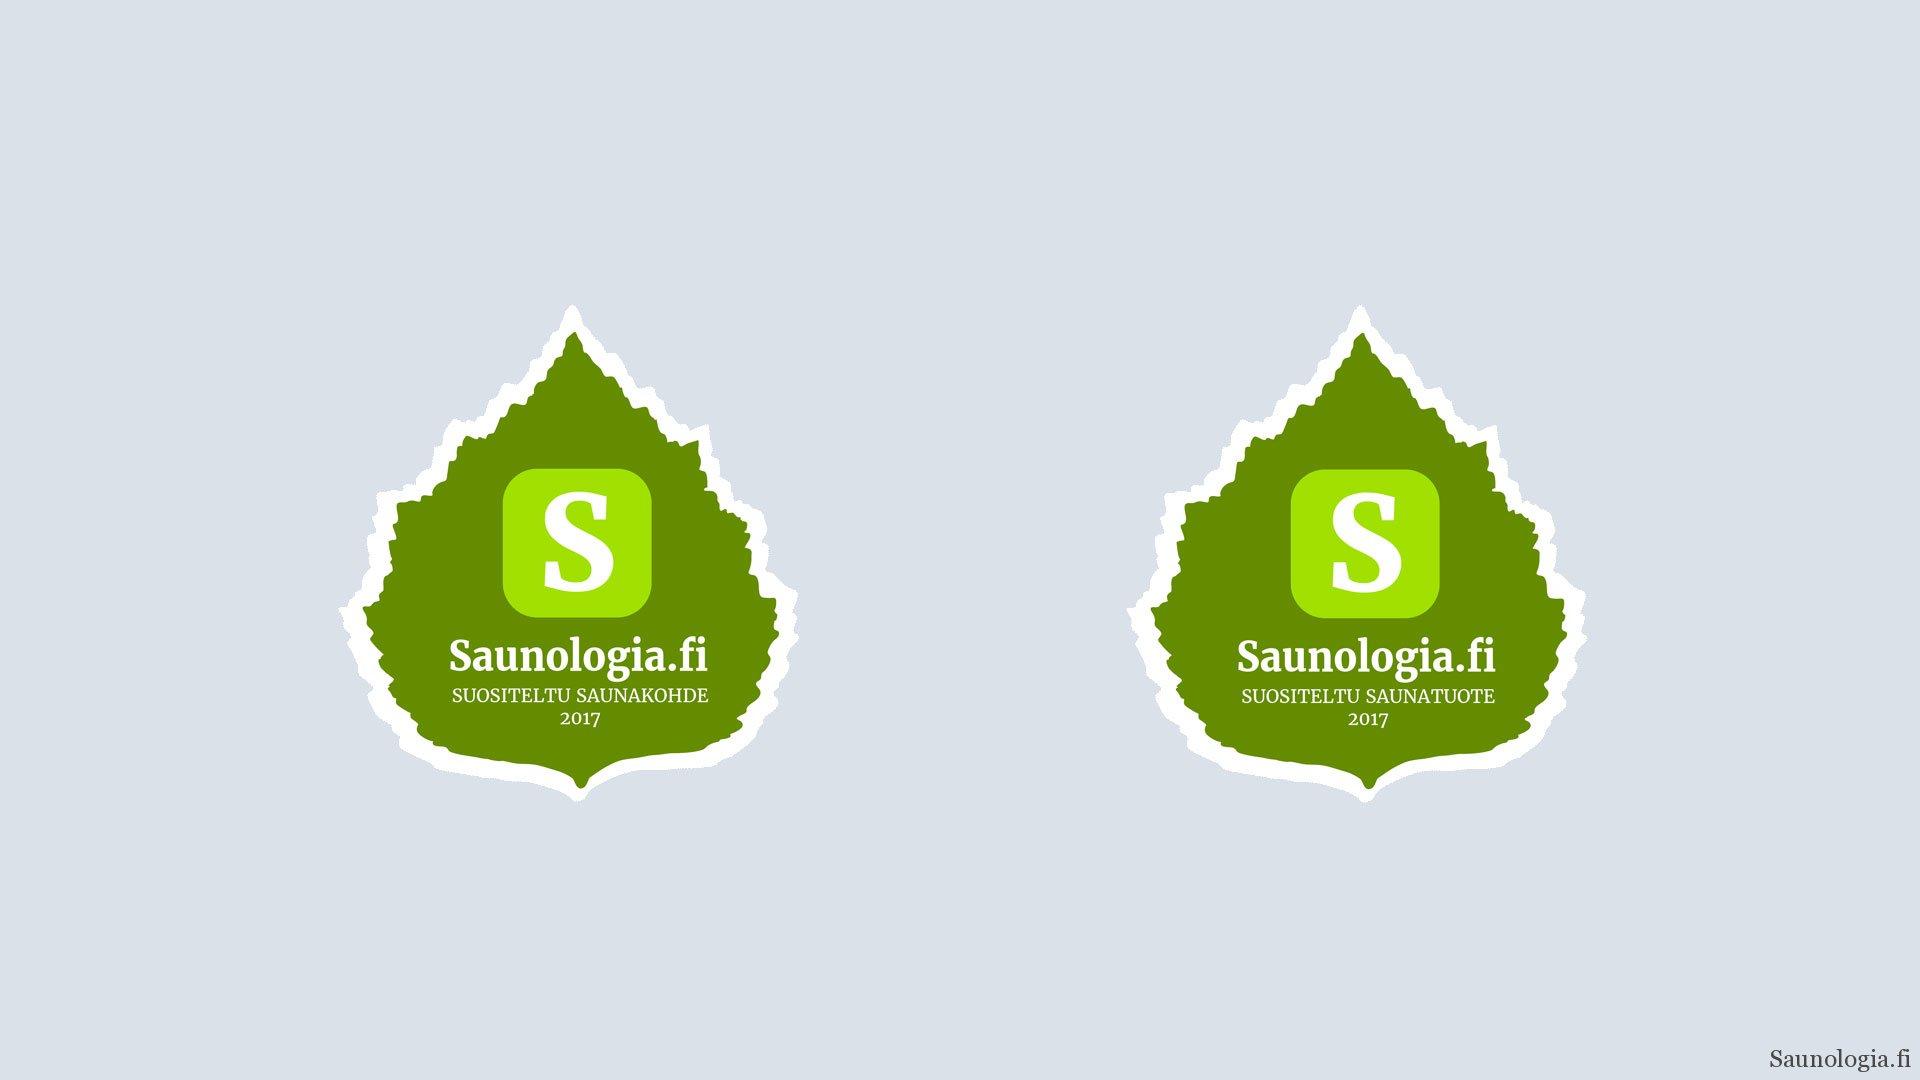 Saunologian suositeltu saunatuote ja saunakohde merkit